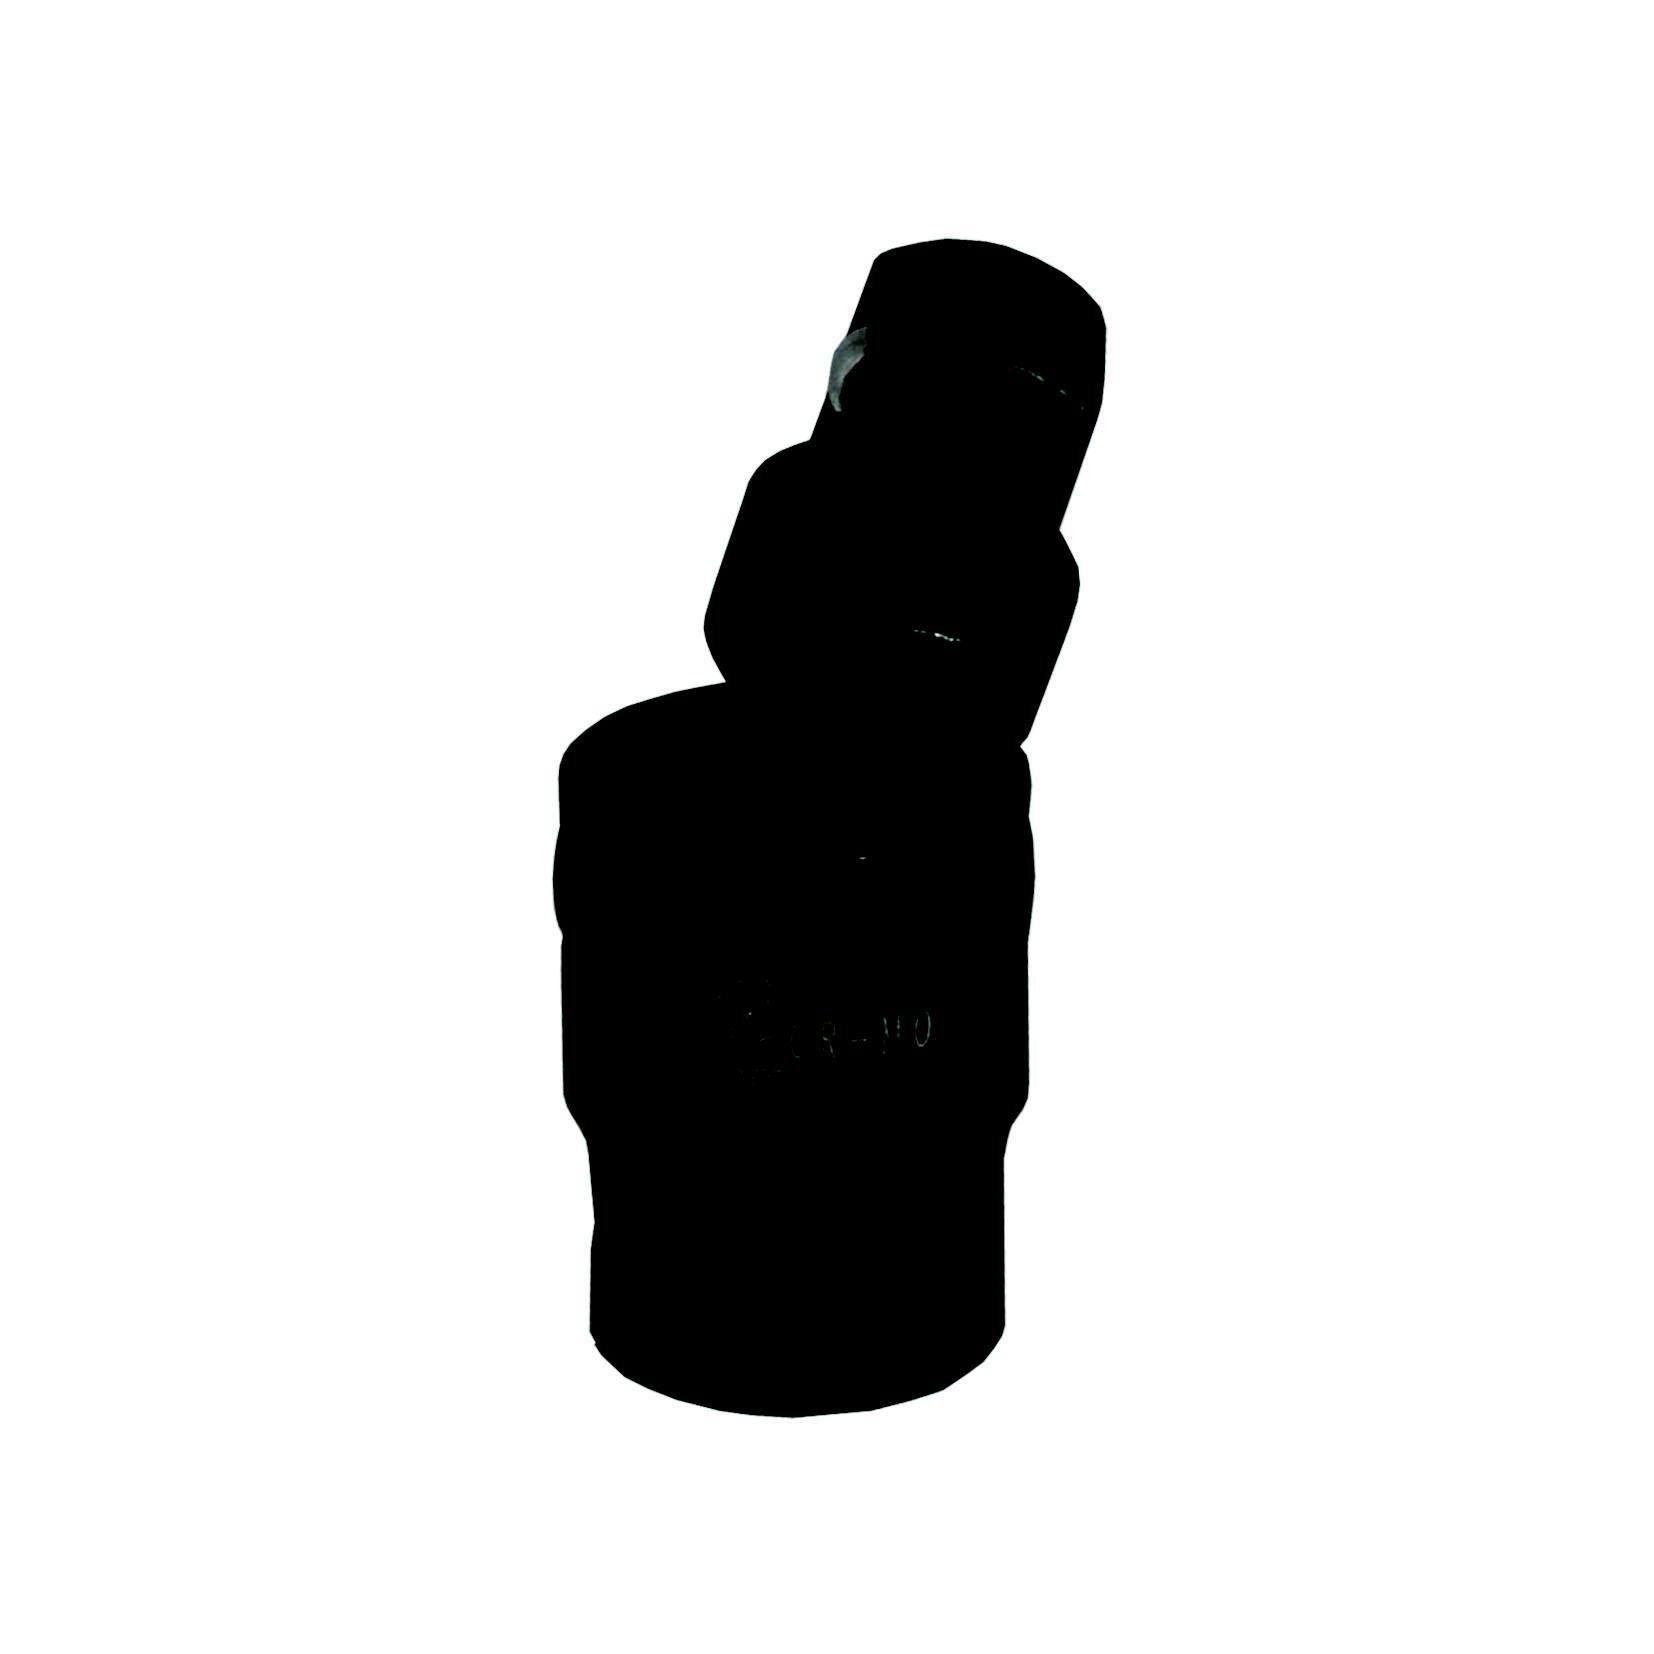 Шарнир карданный Bovidix 5025035